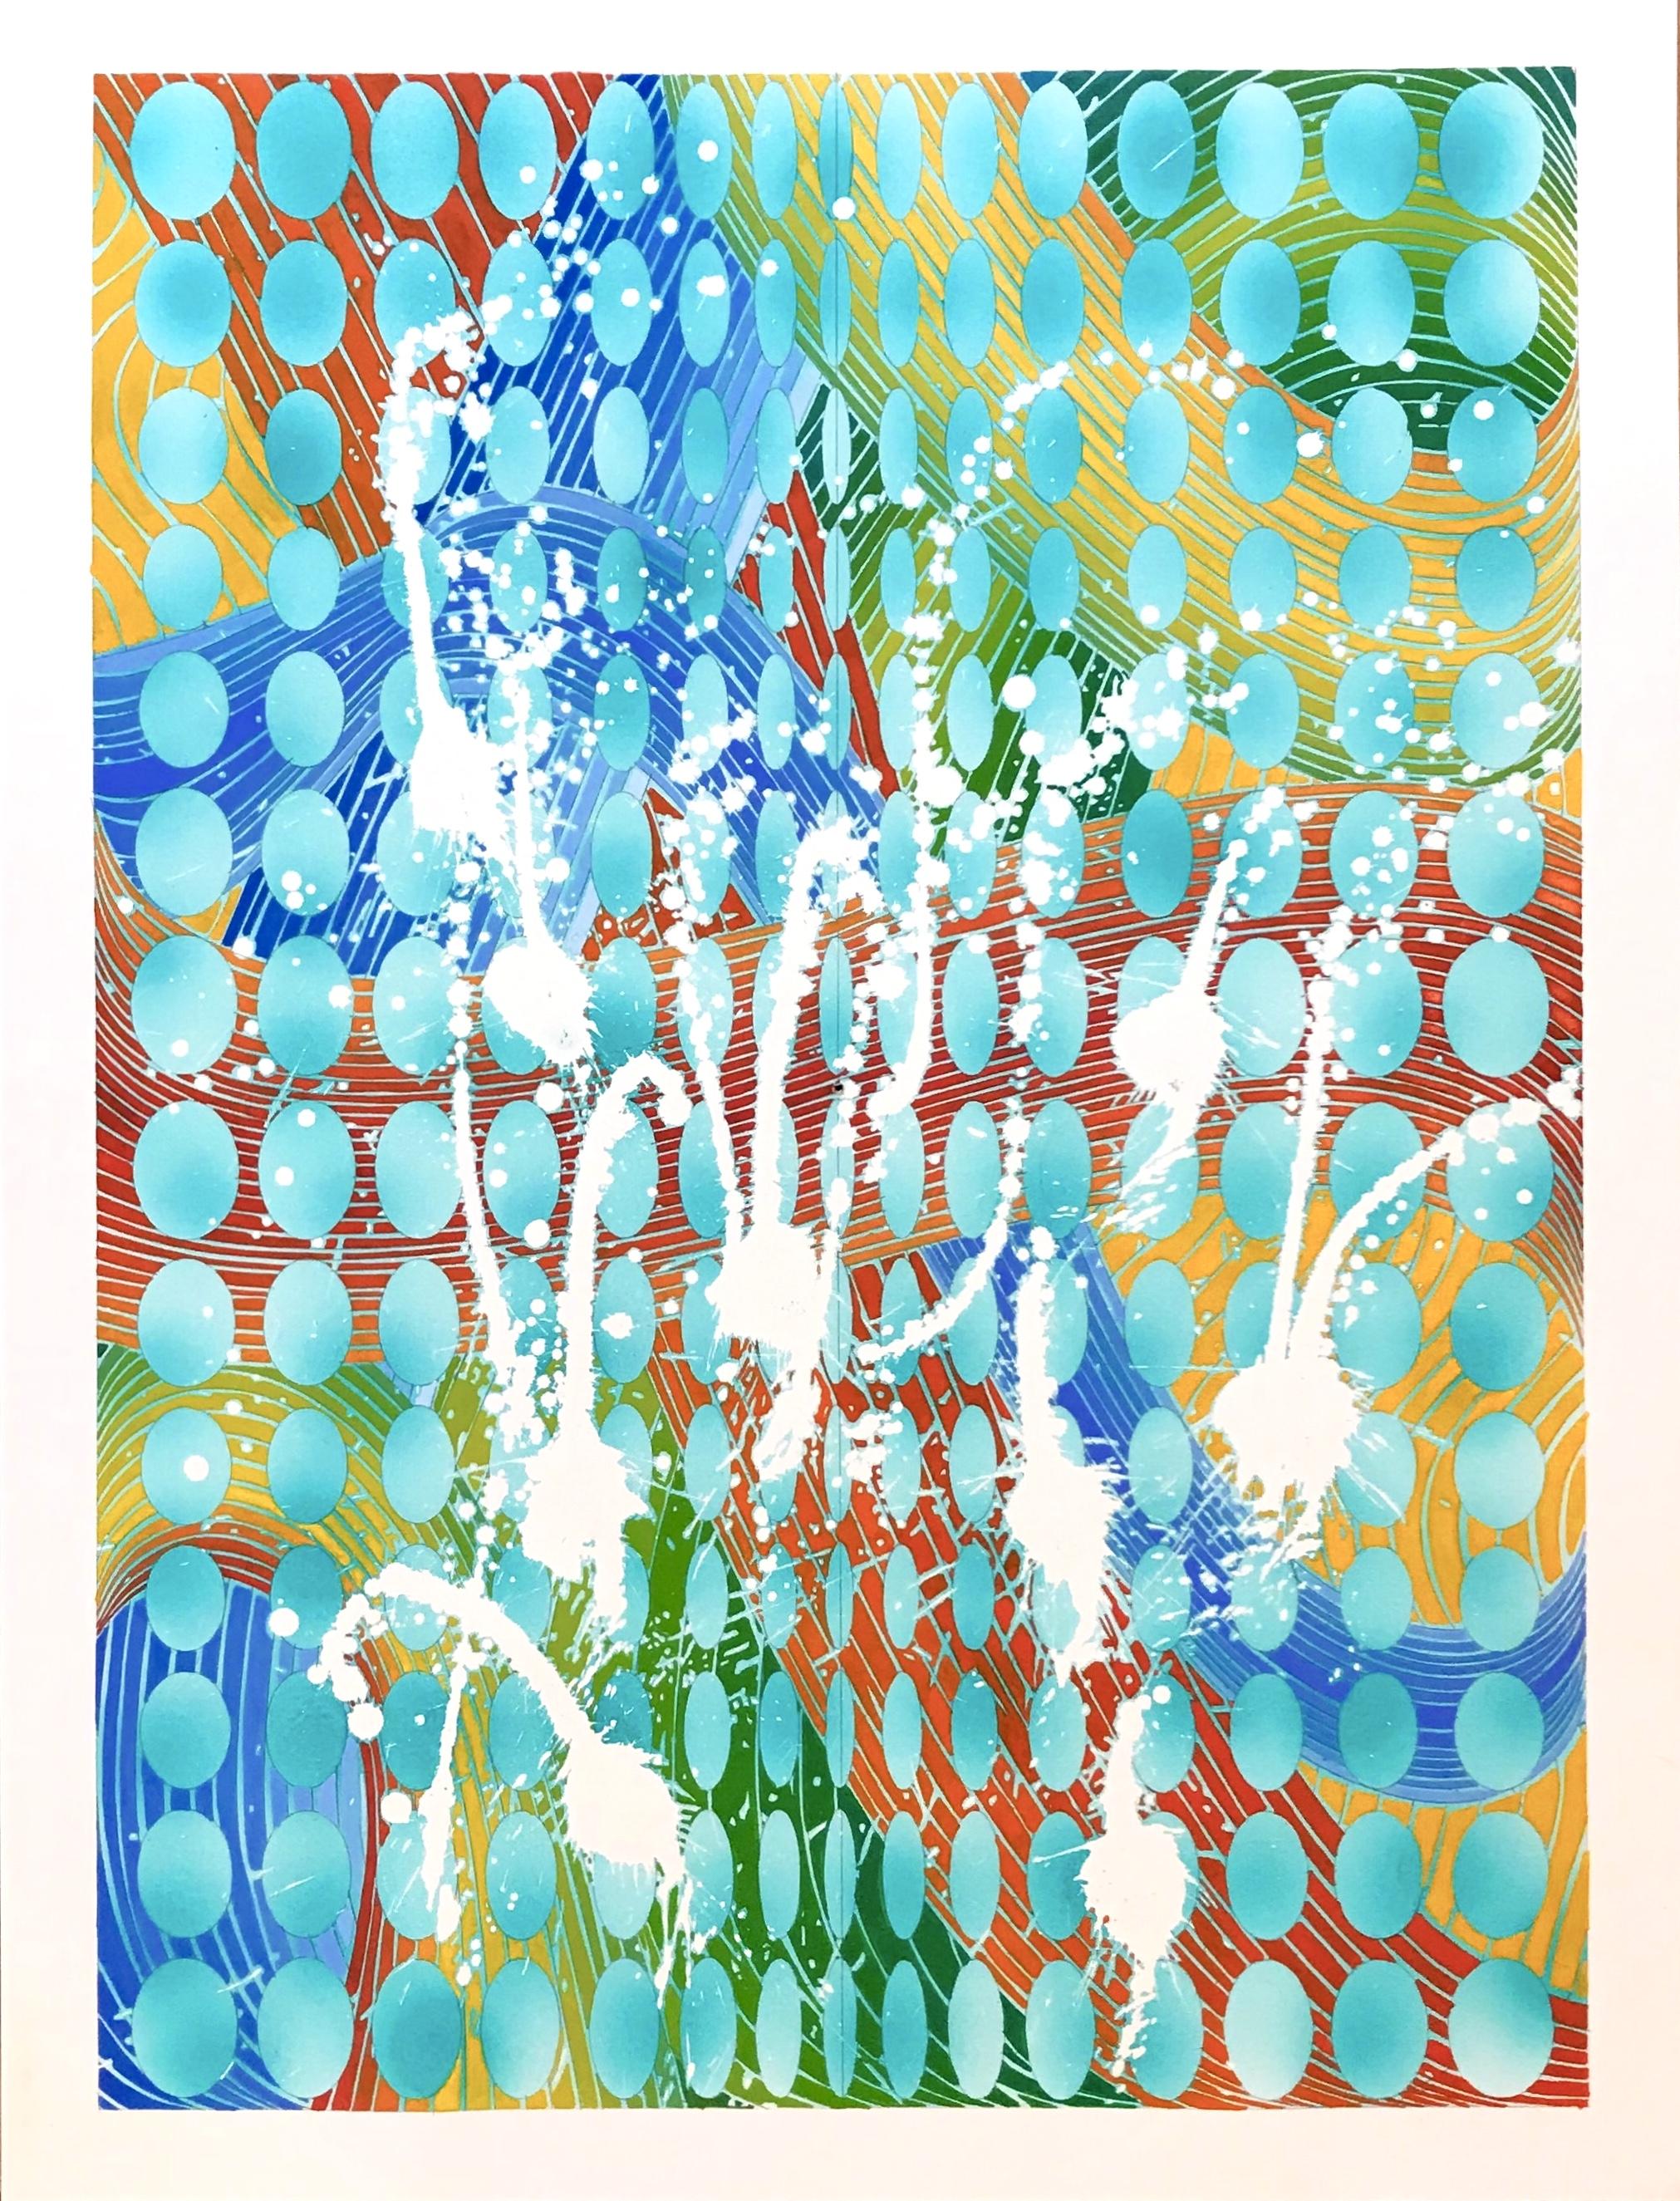 Mermaids on the Beach, 2018, watercolor, 18 x 24 in, $1,500